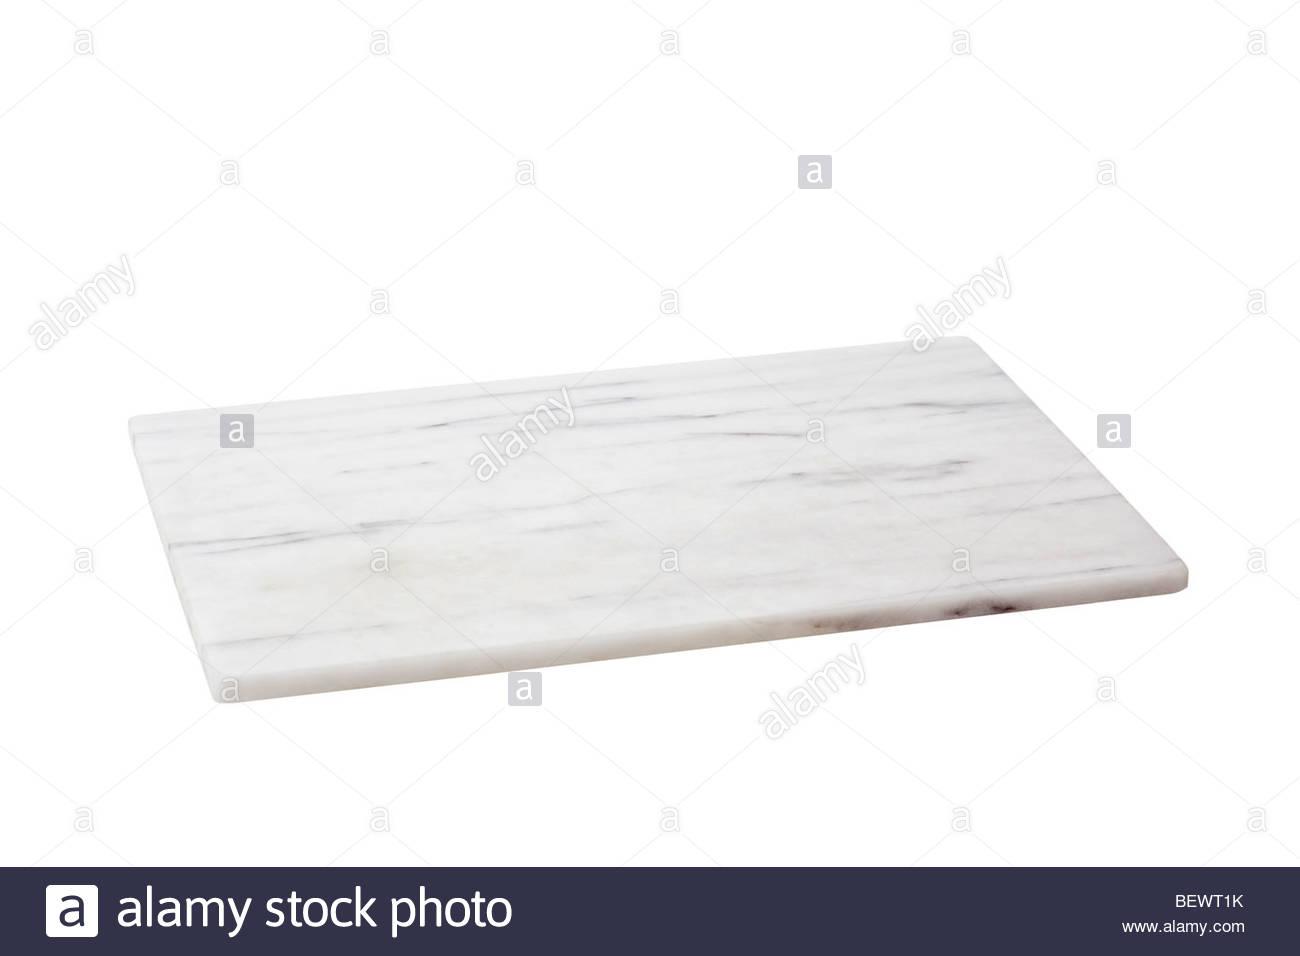 Marble cutting board - Stock Image